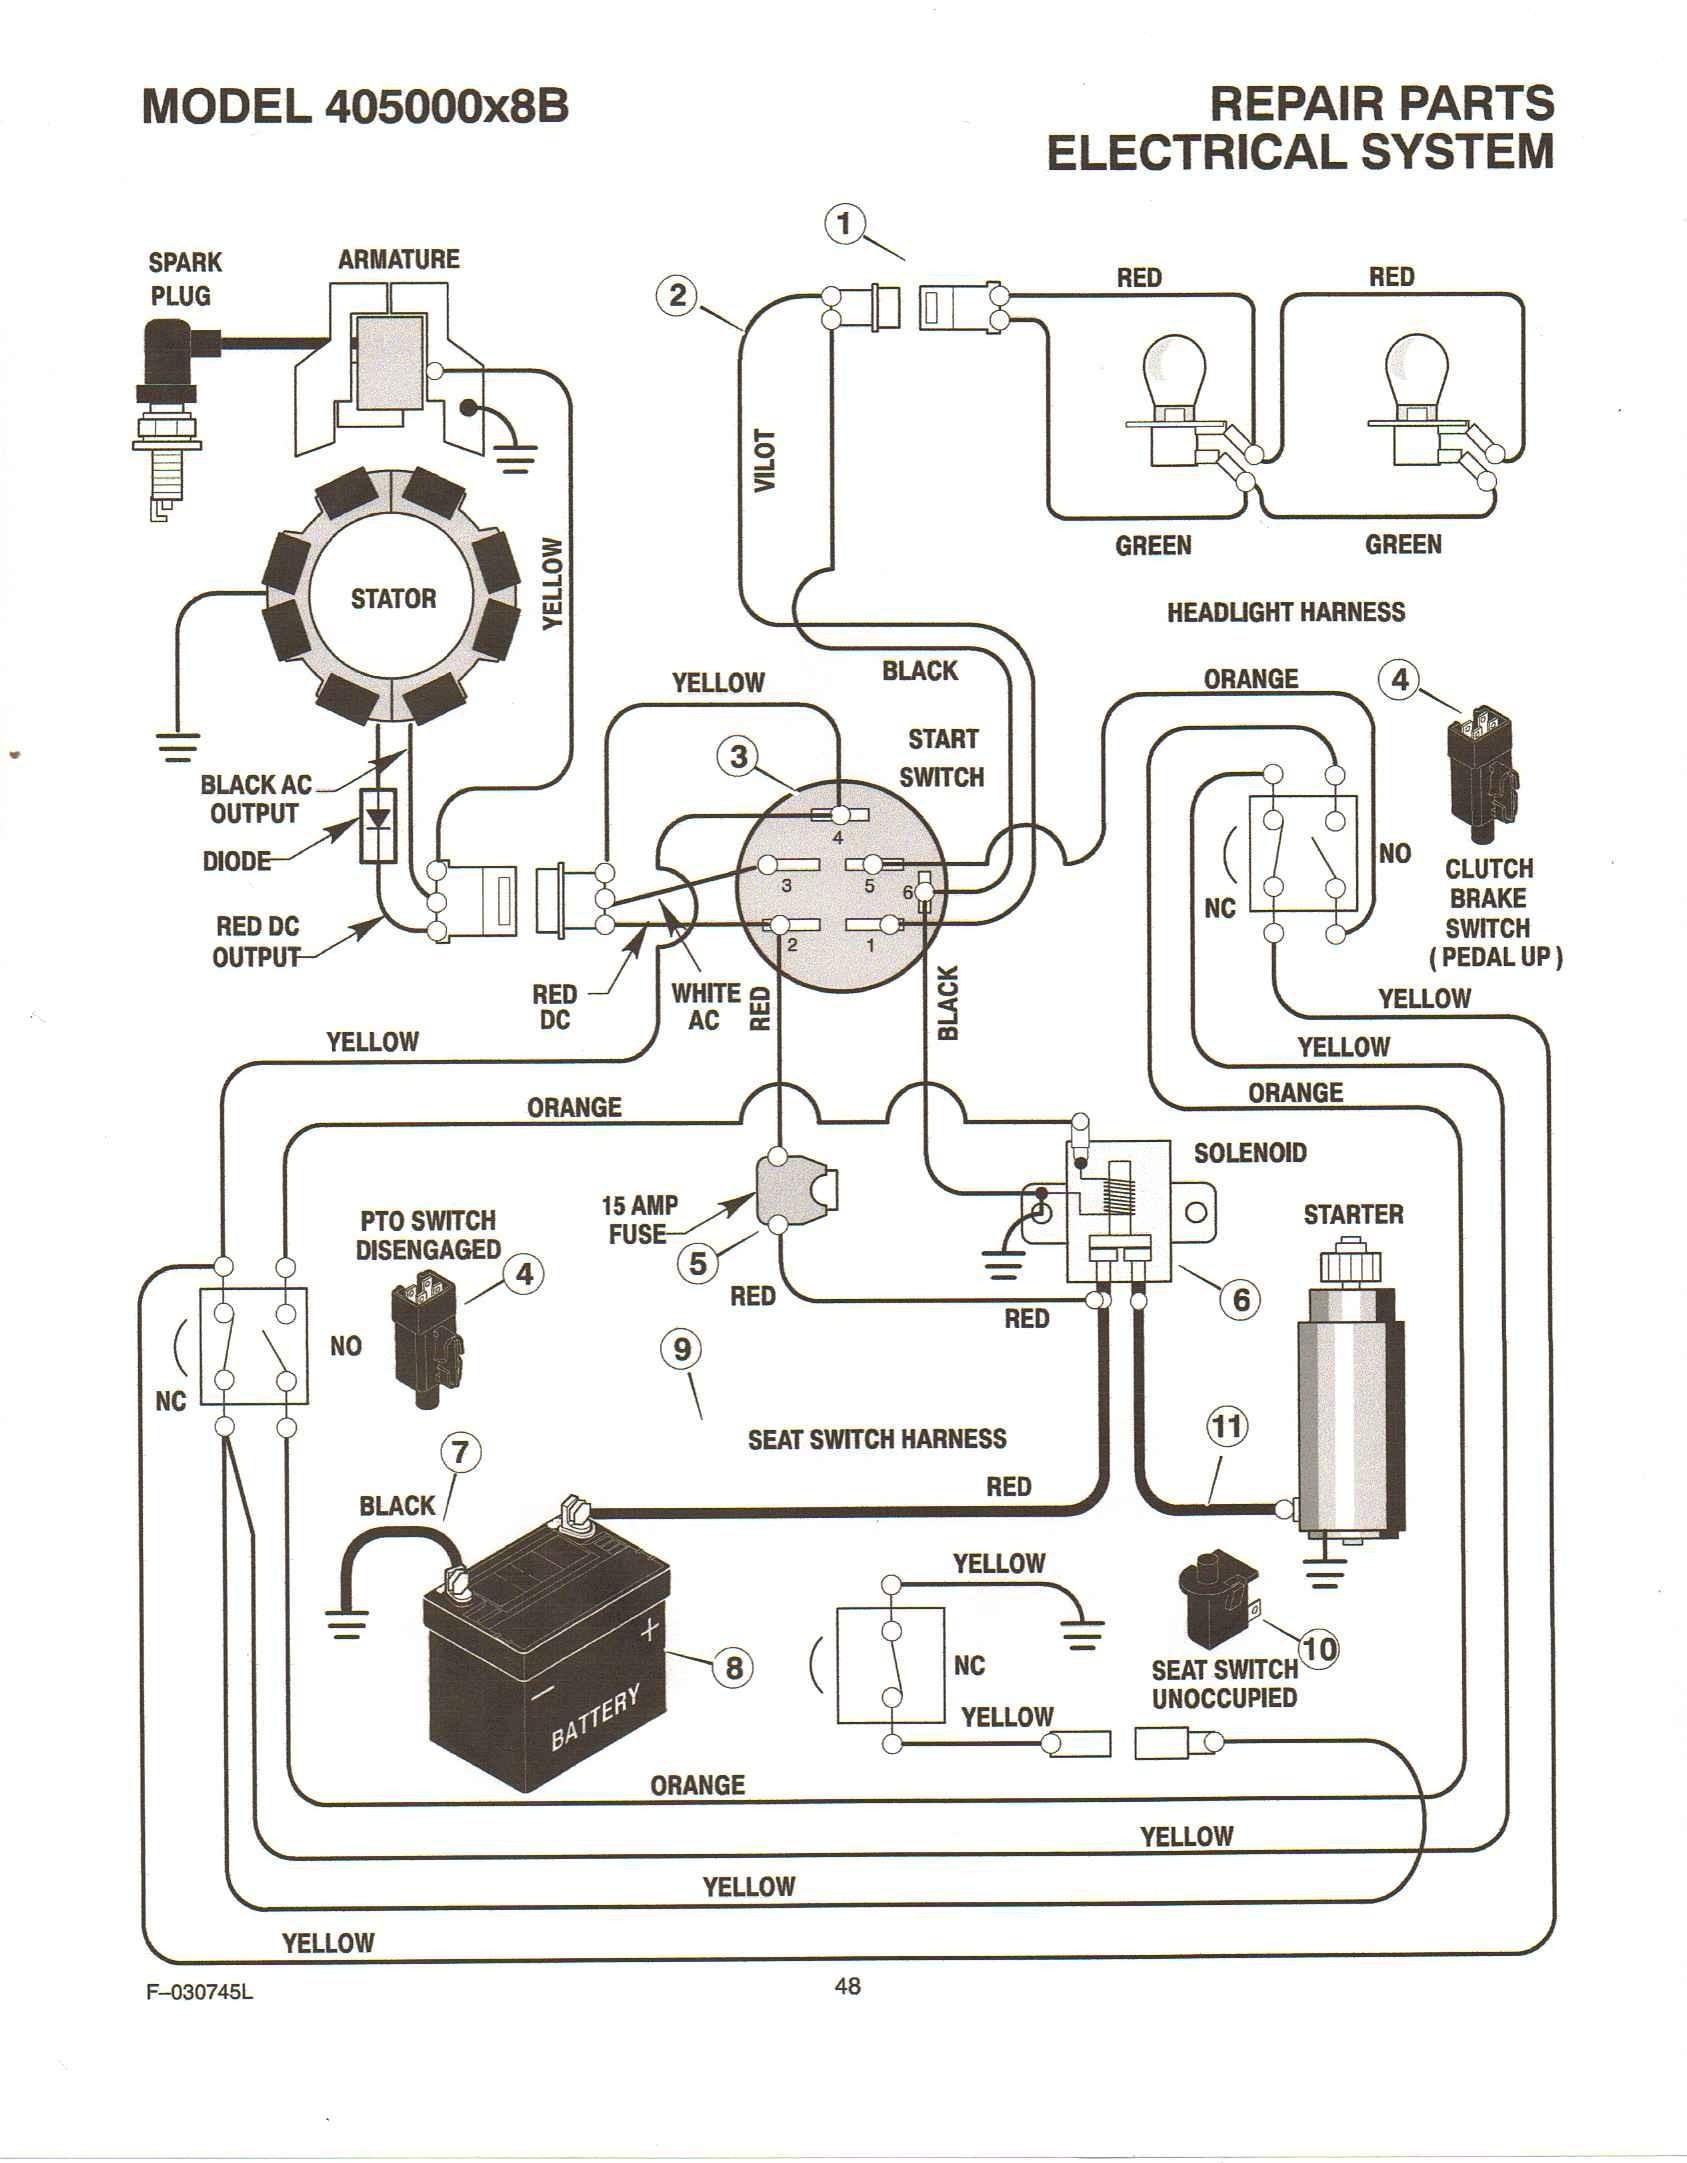 Kohler Engine Wiring Diagram Kohler Ignition Switch Wiring Diagram Best Wiring Diagram for Kohler Of Kohler Engine Wiring Diagram